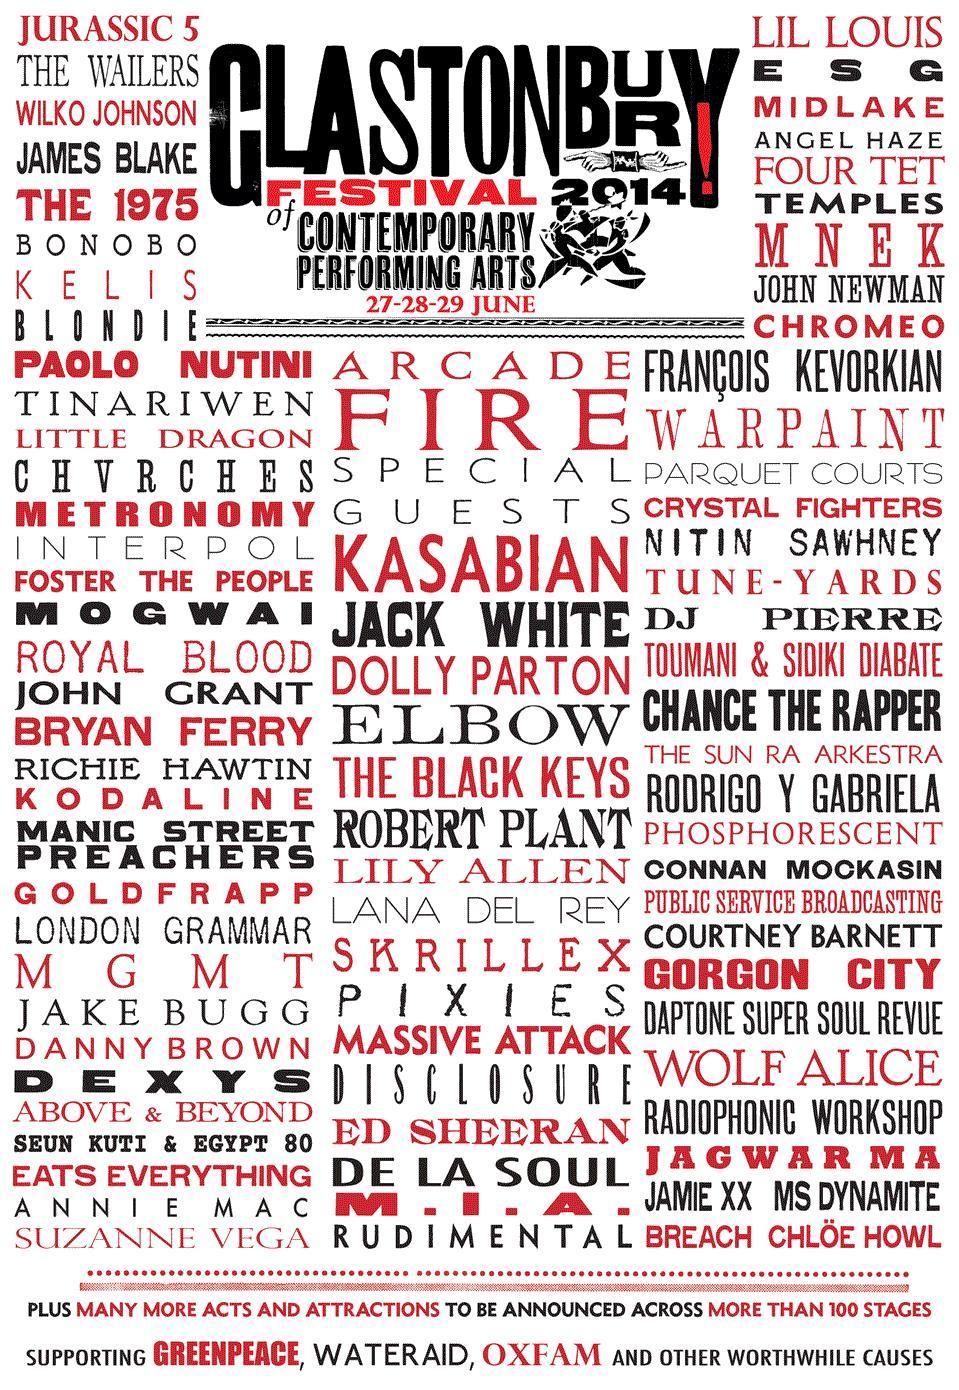 Glastonbury 2014 line-up 1